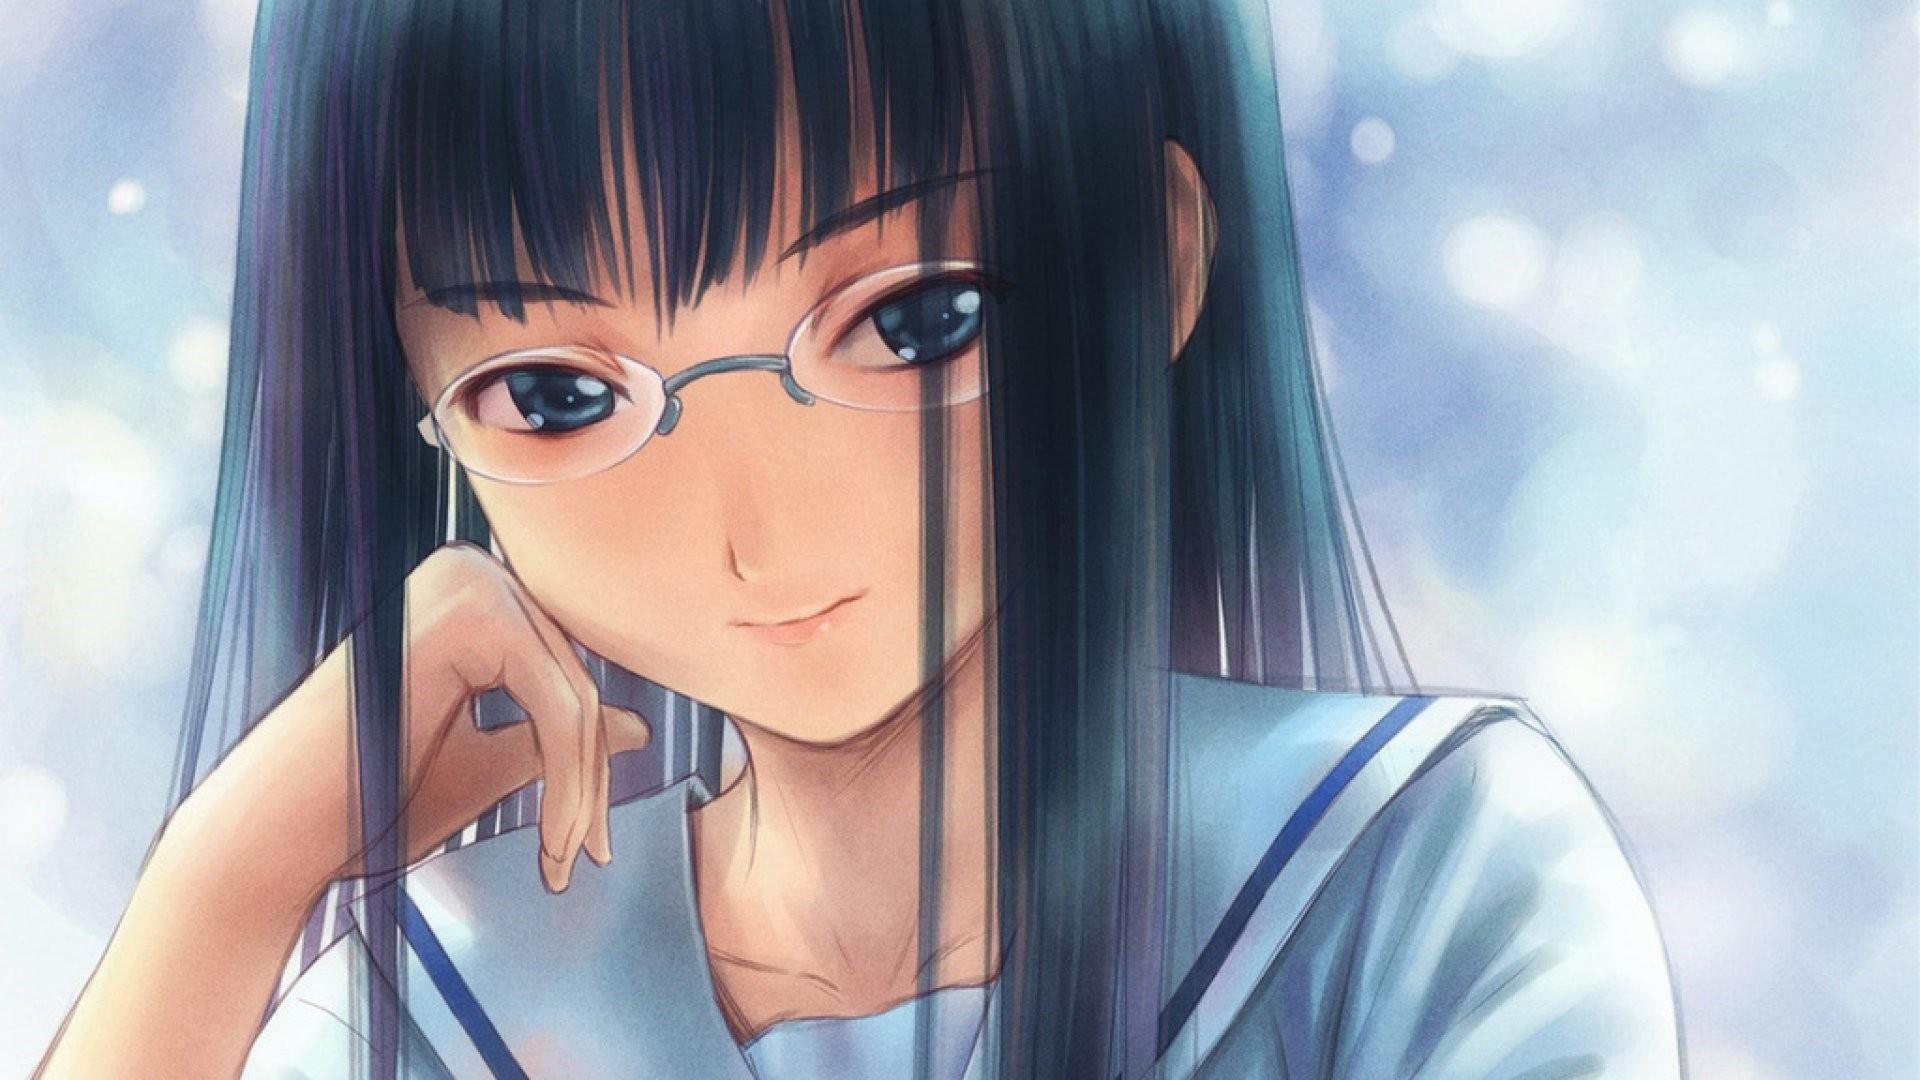 Anime Girl With Glasses Wallpaper